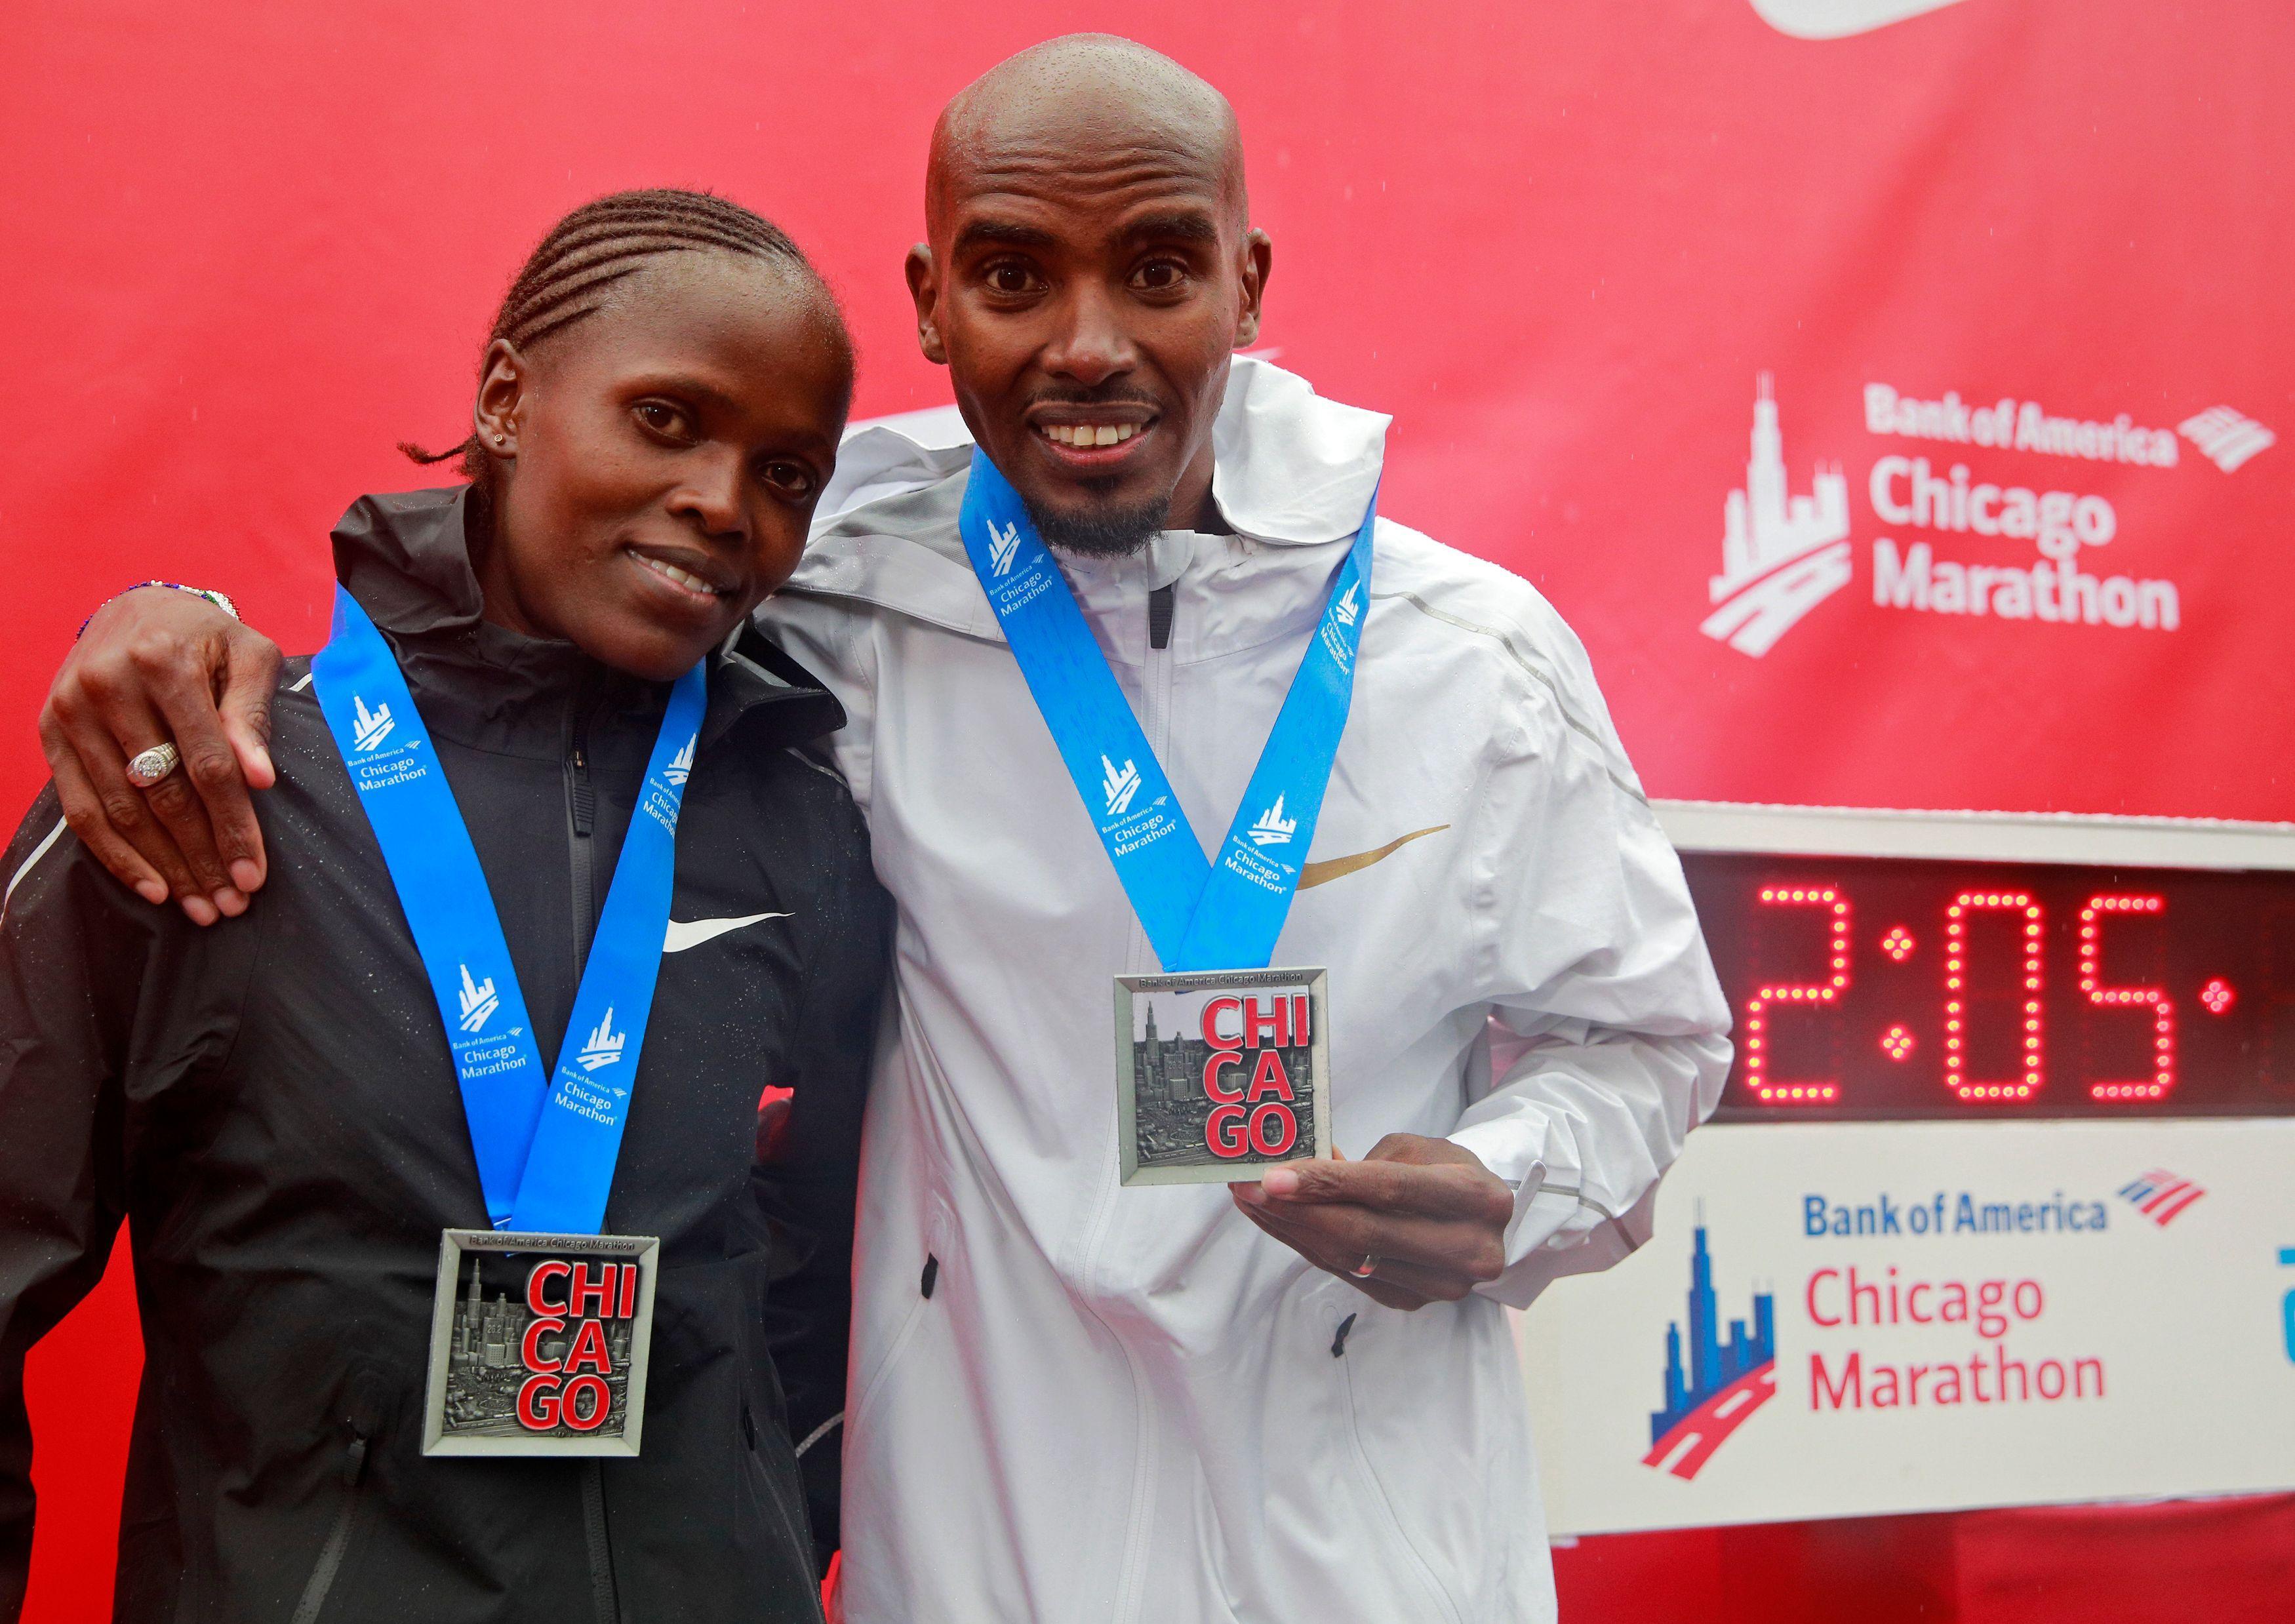 Farah poses with the winner of the women's race, Kenyan runner Brigid Kosgei